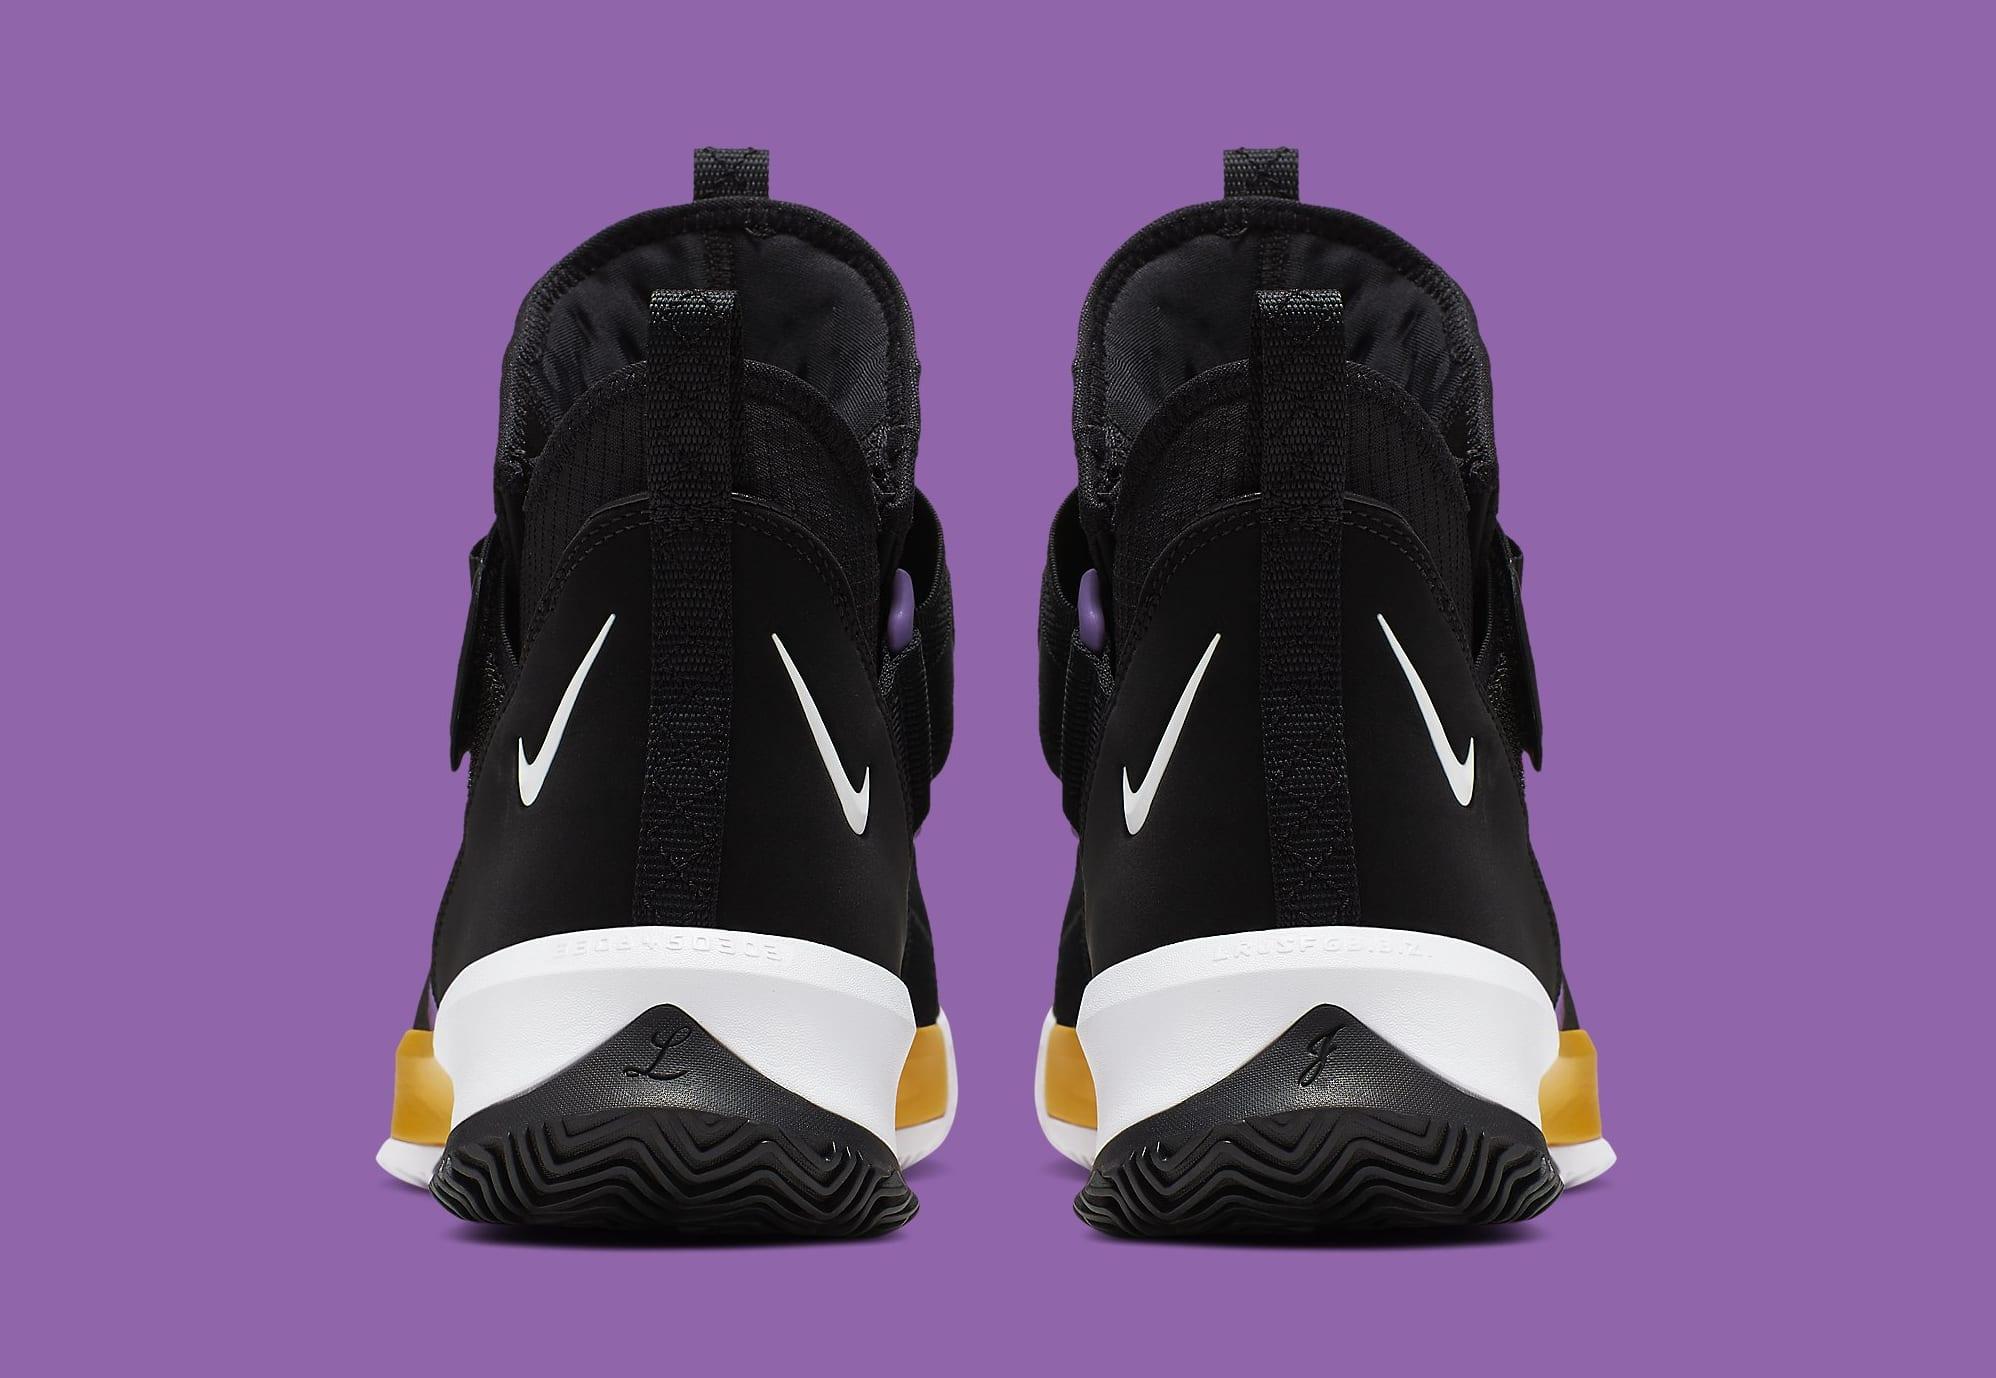 Nike LeBron Soldier 13 Lakers Release Date AR4228-004 Heel